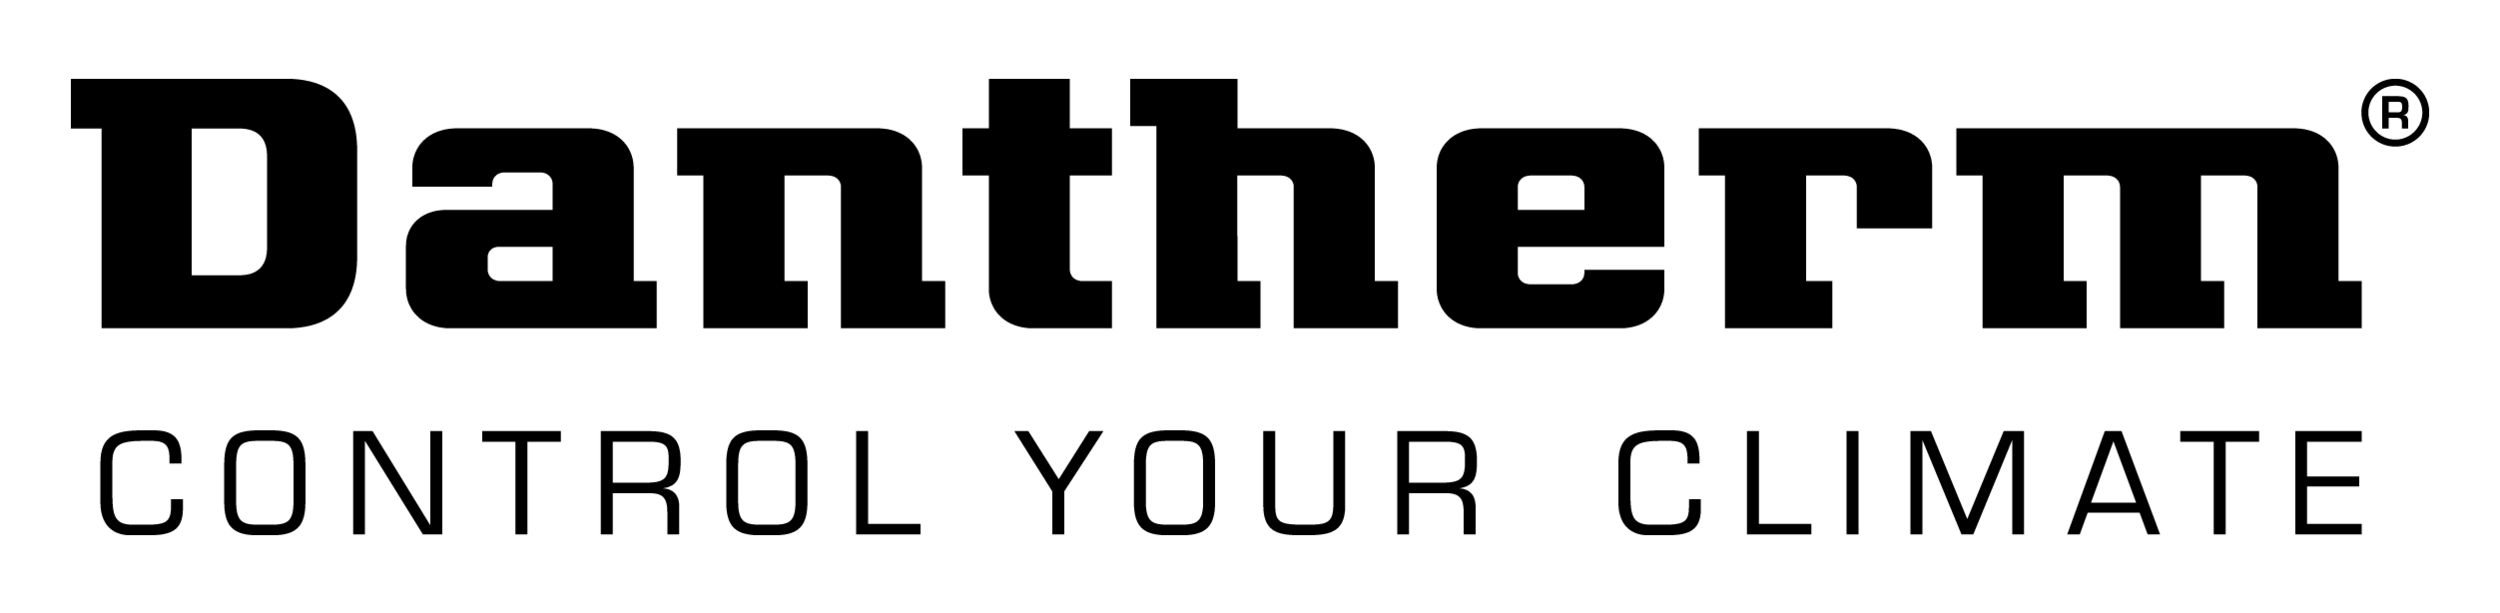 Dantherm Dehumidifiers